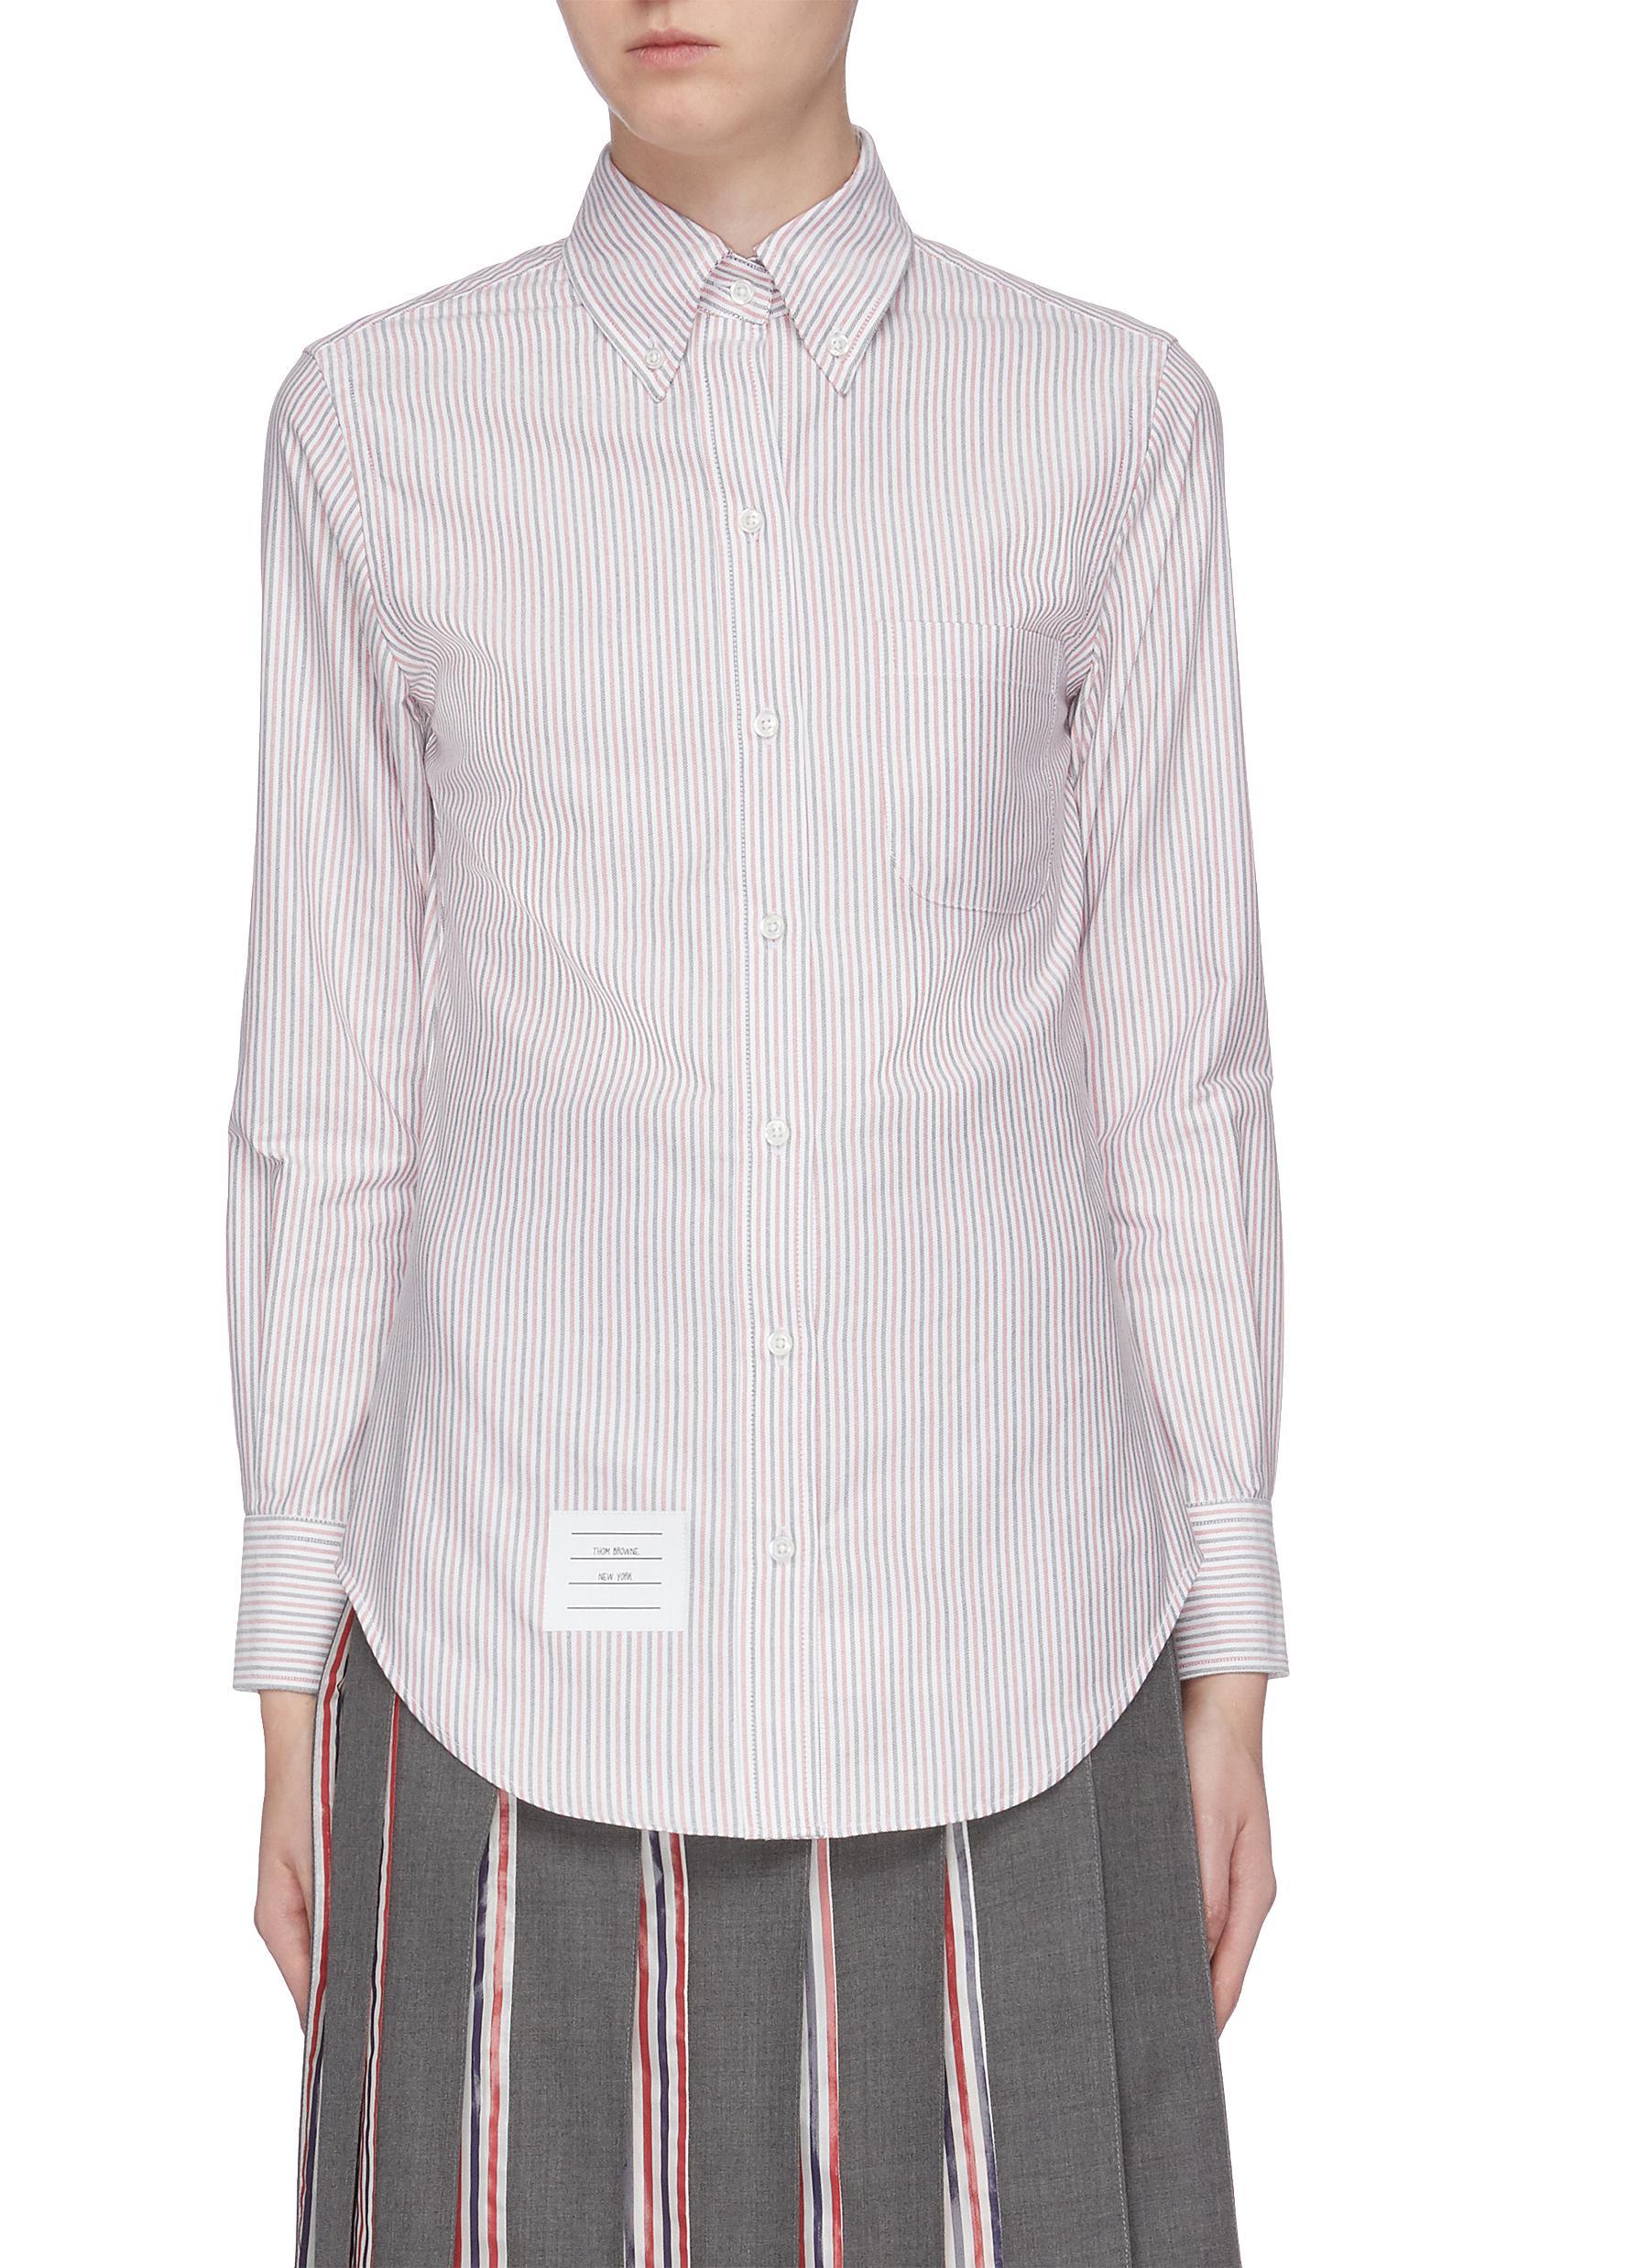 Pinstripe Oxford shirt by Thom Browne